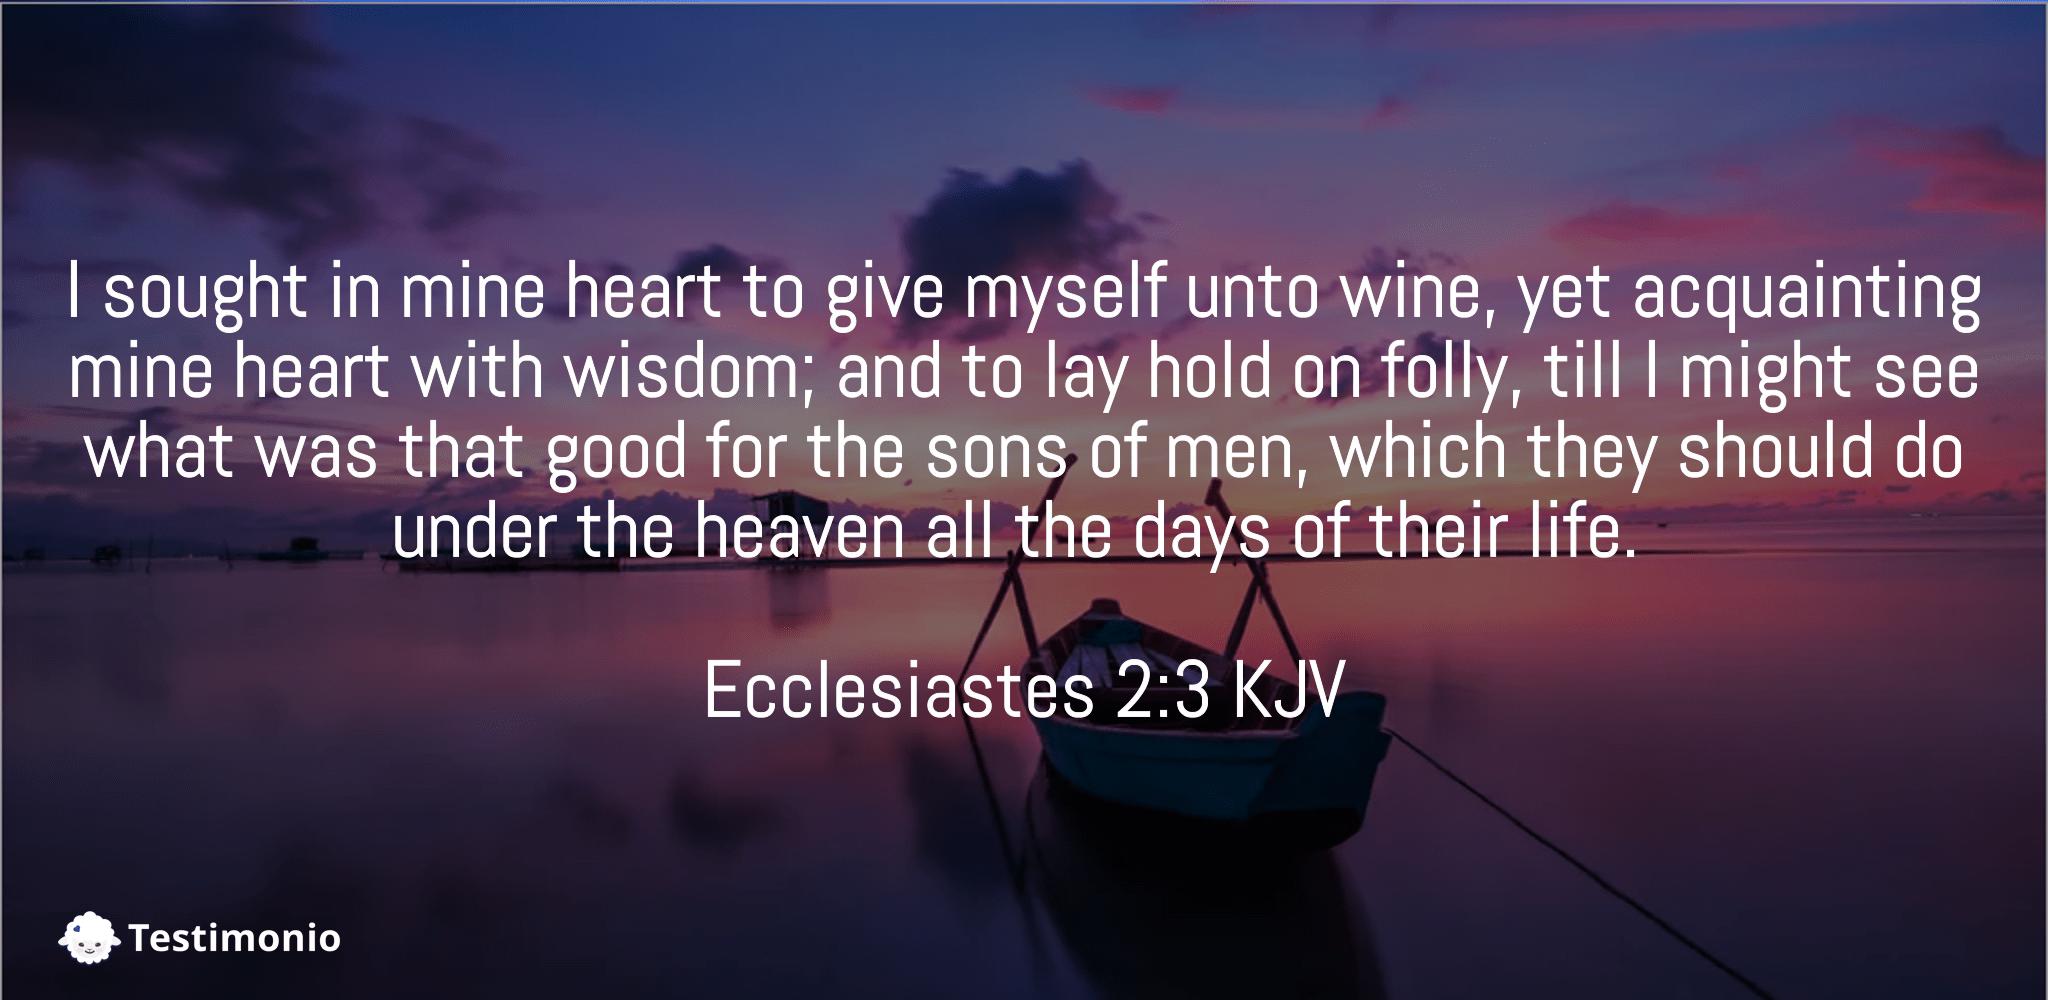 Ecclesiastes 2:3